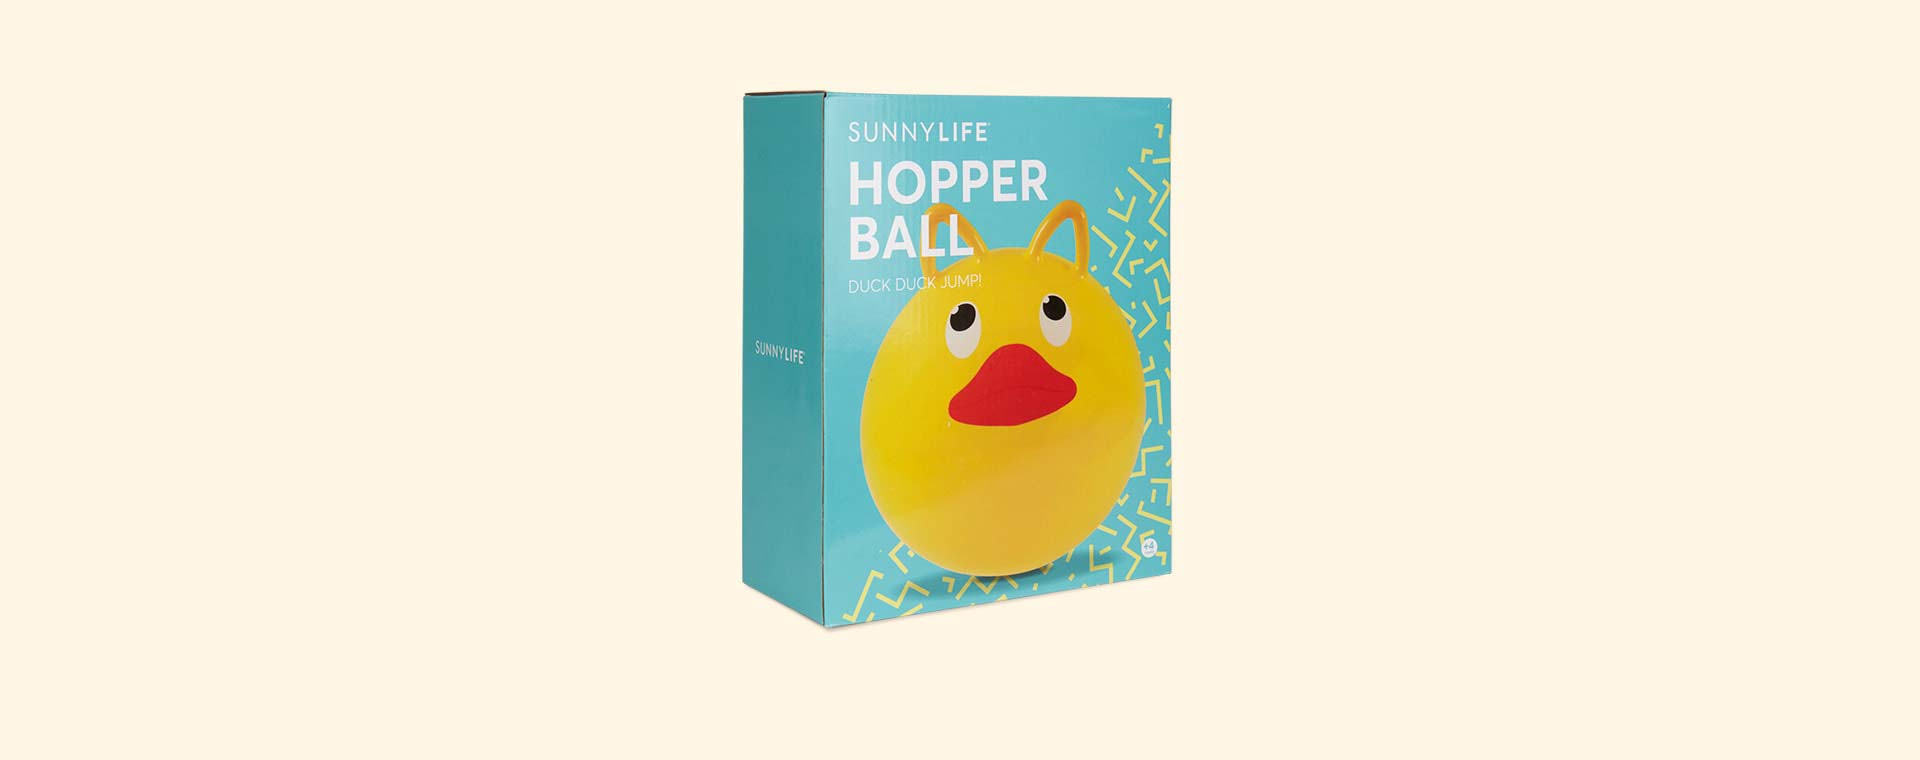 Yellow Sunnylife Ducky Hopper Ball